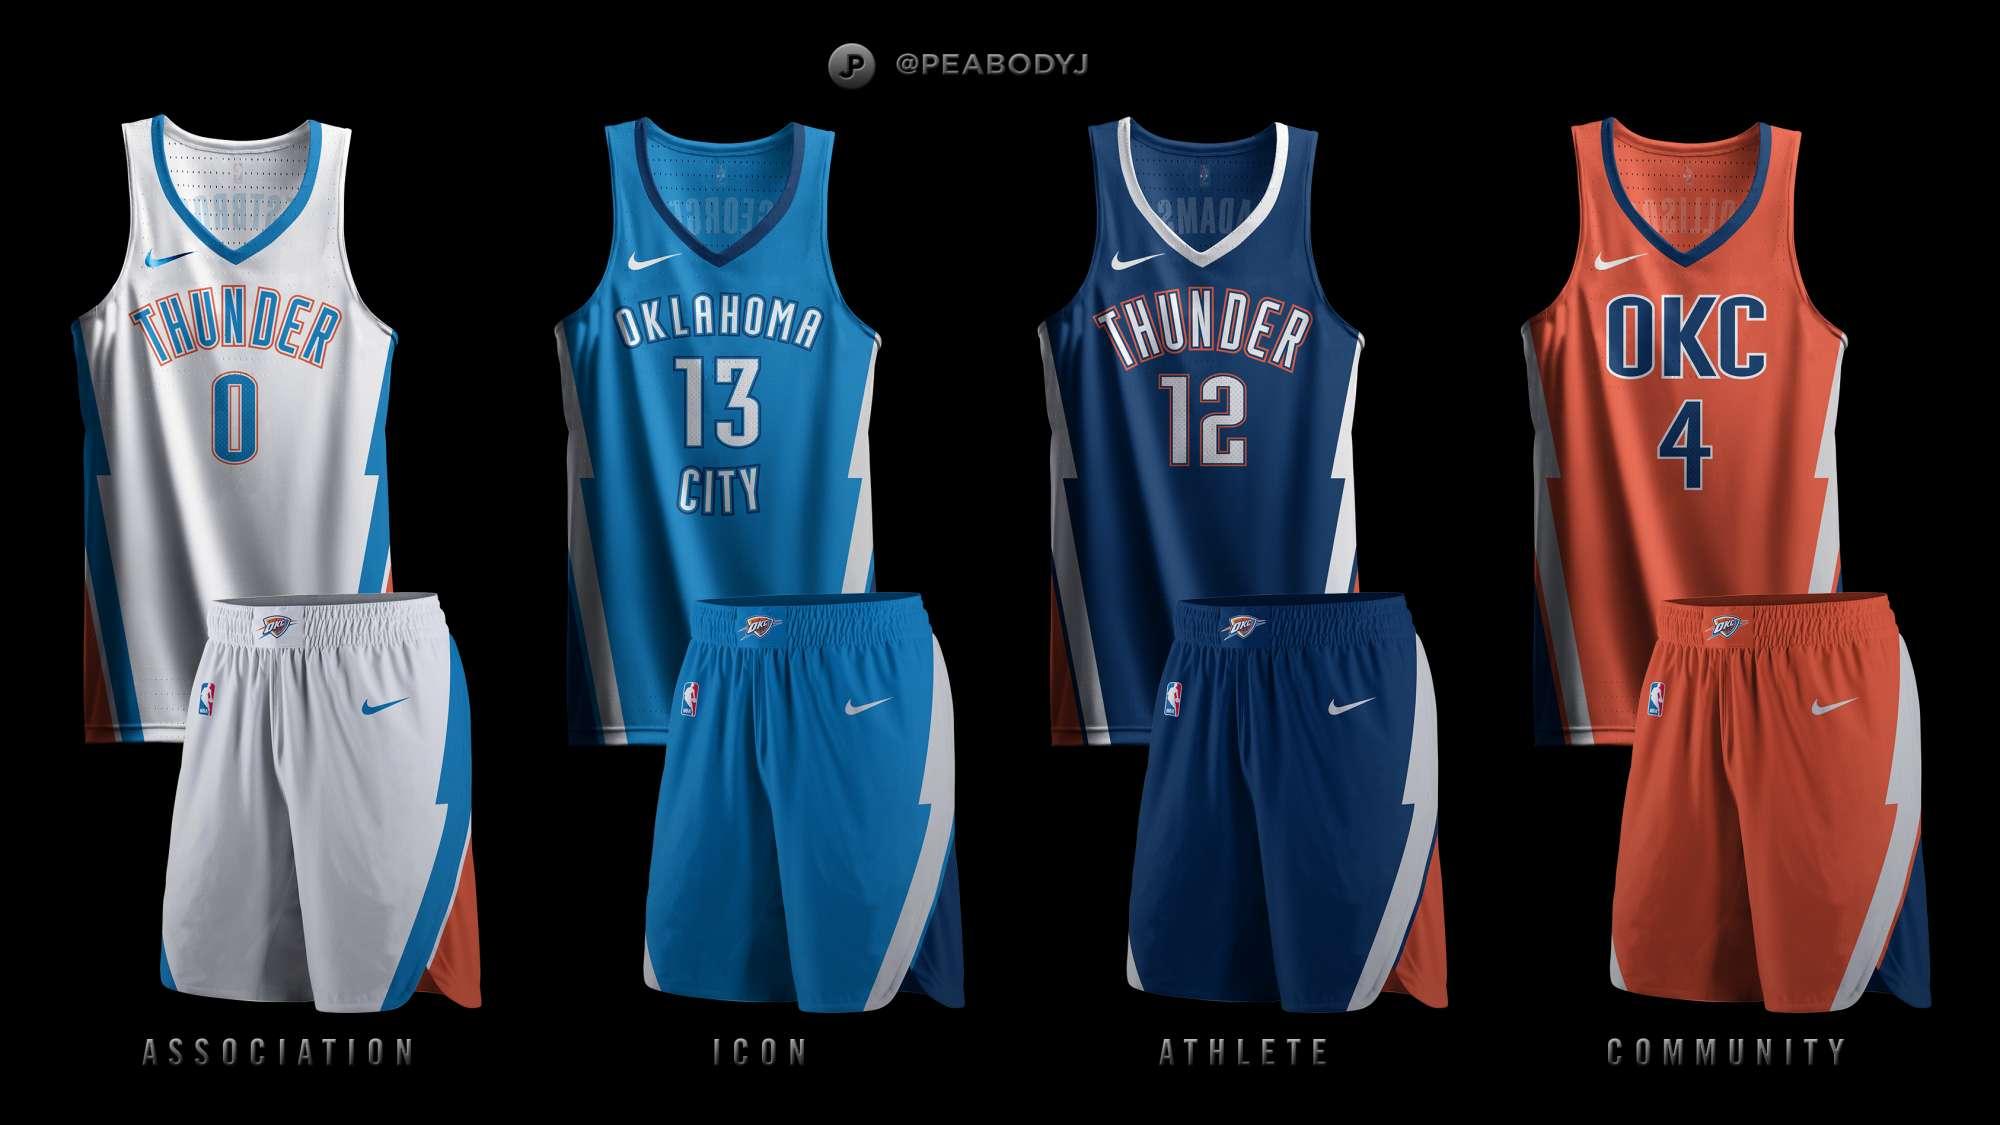 huge discount 0f8a1 872e2 Oklahoma City Thunder x Nike Concepts - Concepts - Chris ...